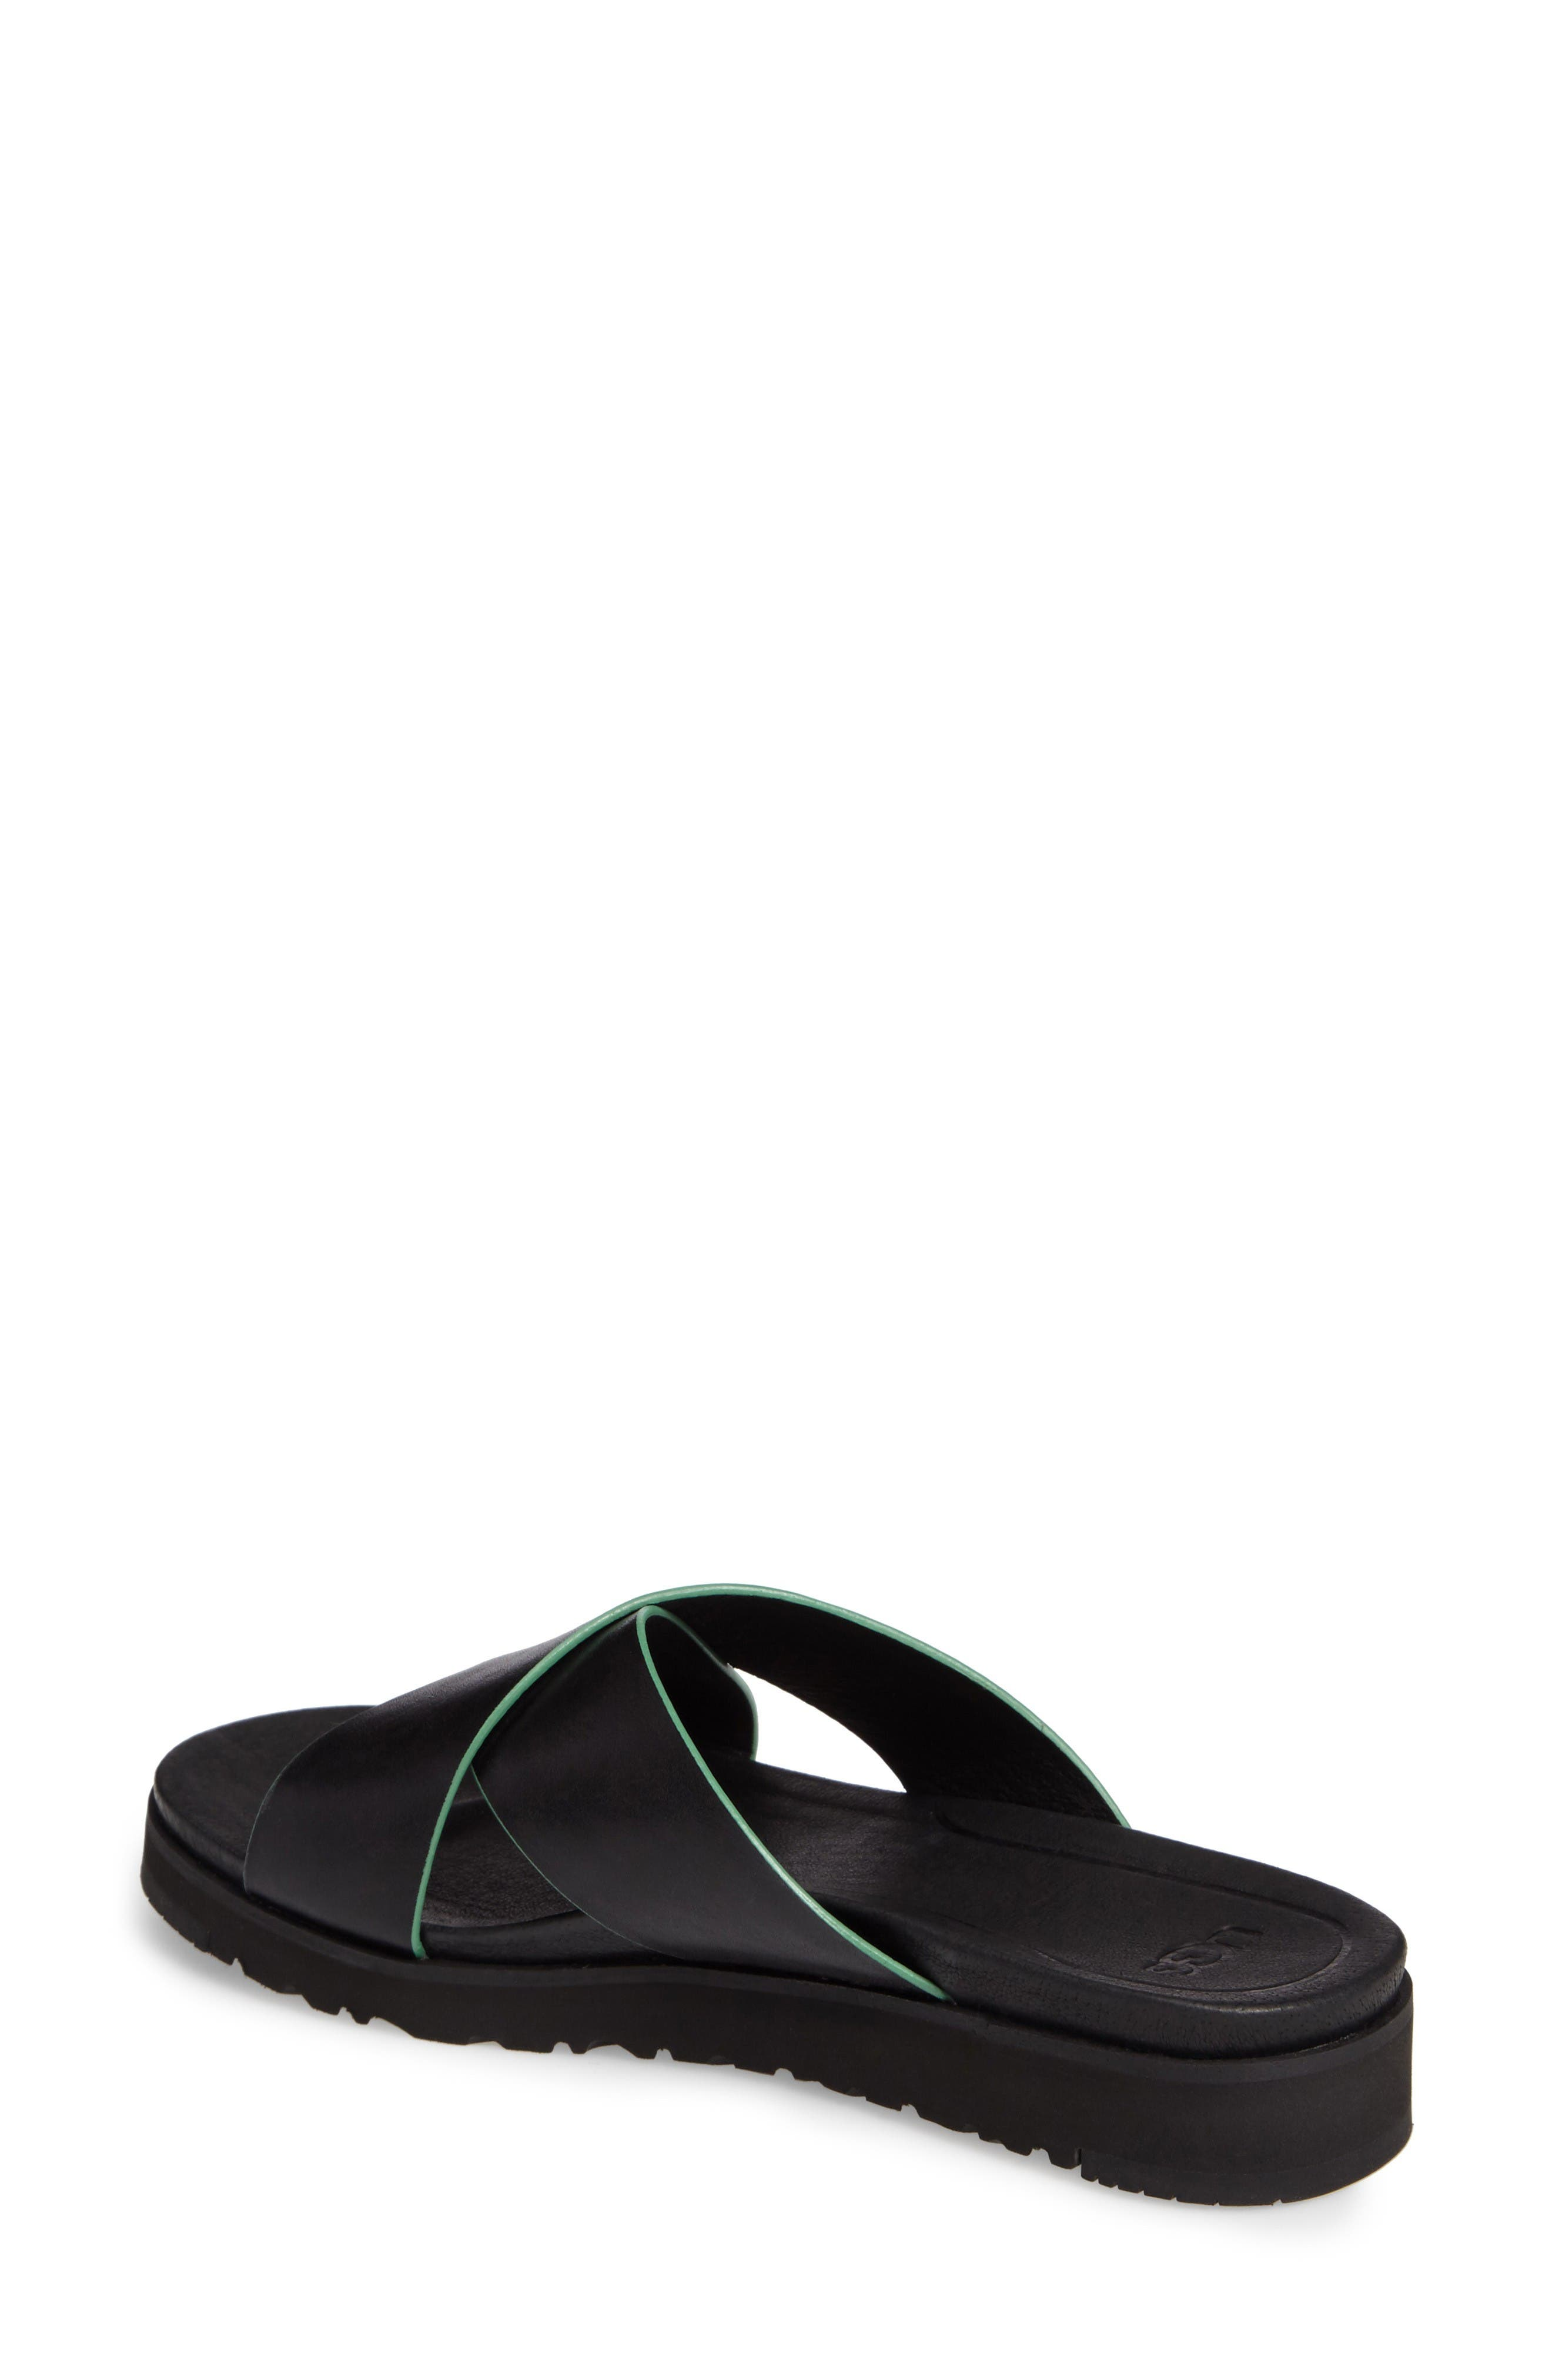 Alternate Image 2  - UGG® 'Kari' Sandal (Women)